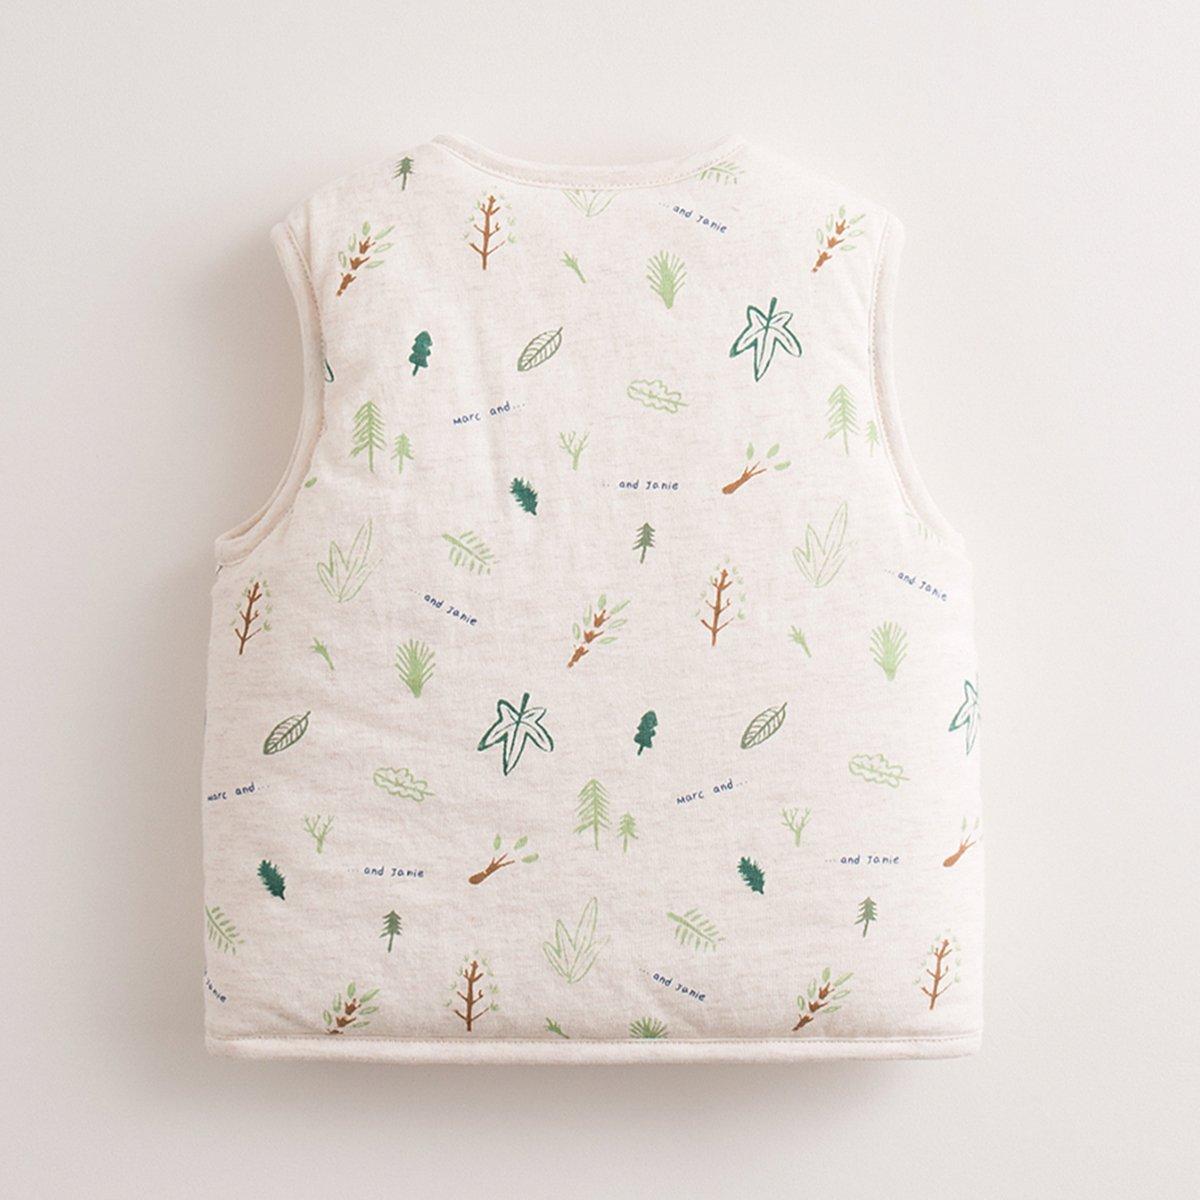 marc janie Baby Toddler Boys Girls Outerwear Warm Cartoon Pattern Print Vest Cotton-Padded Waistcoat